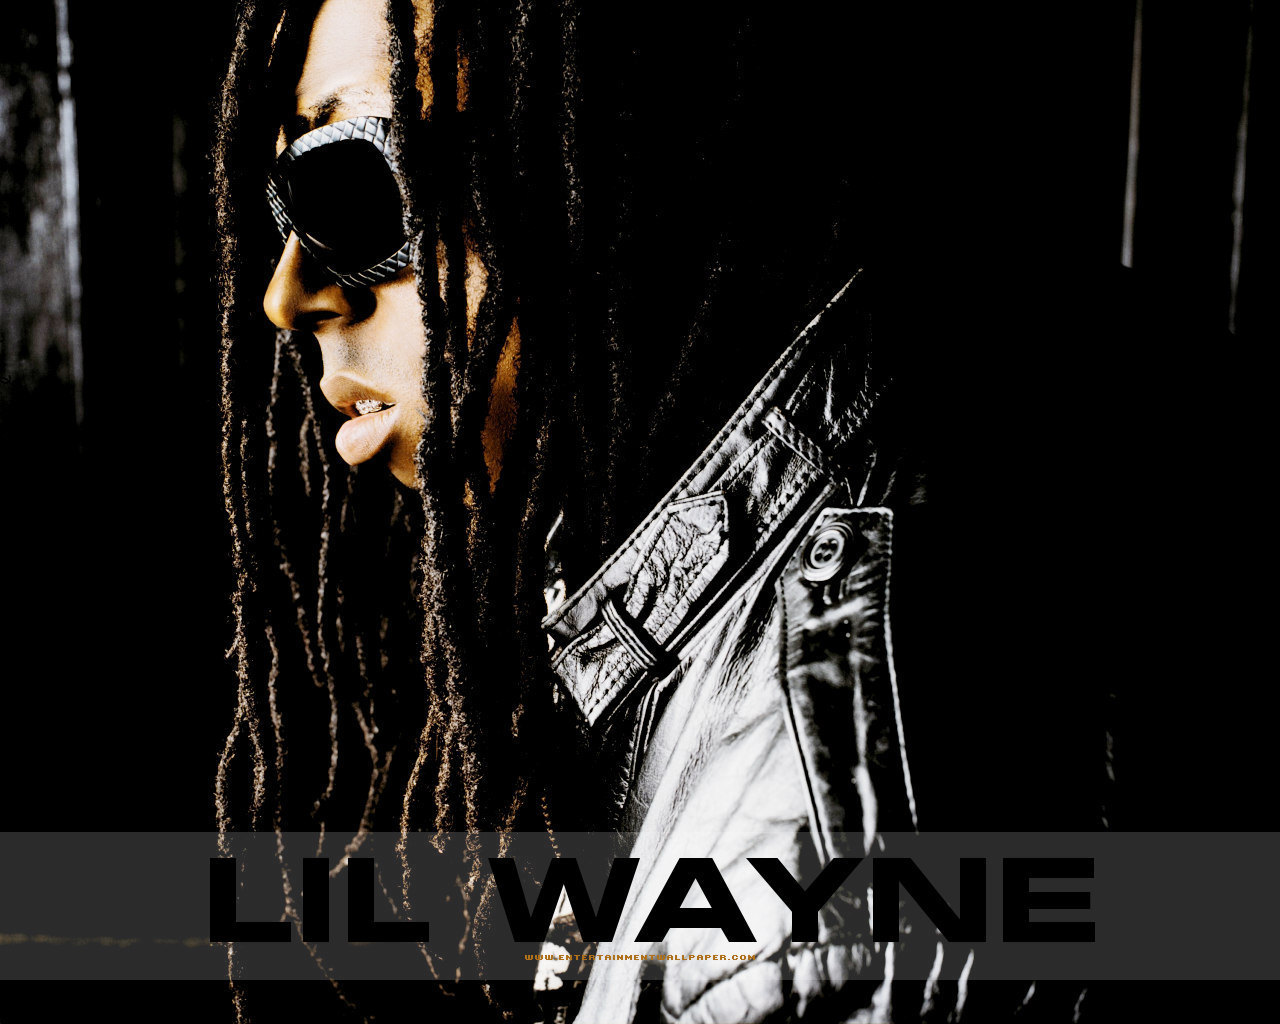 -LiLWayne♥